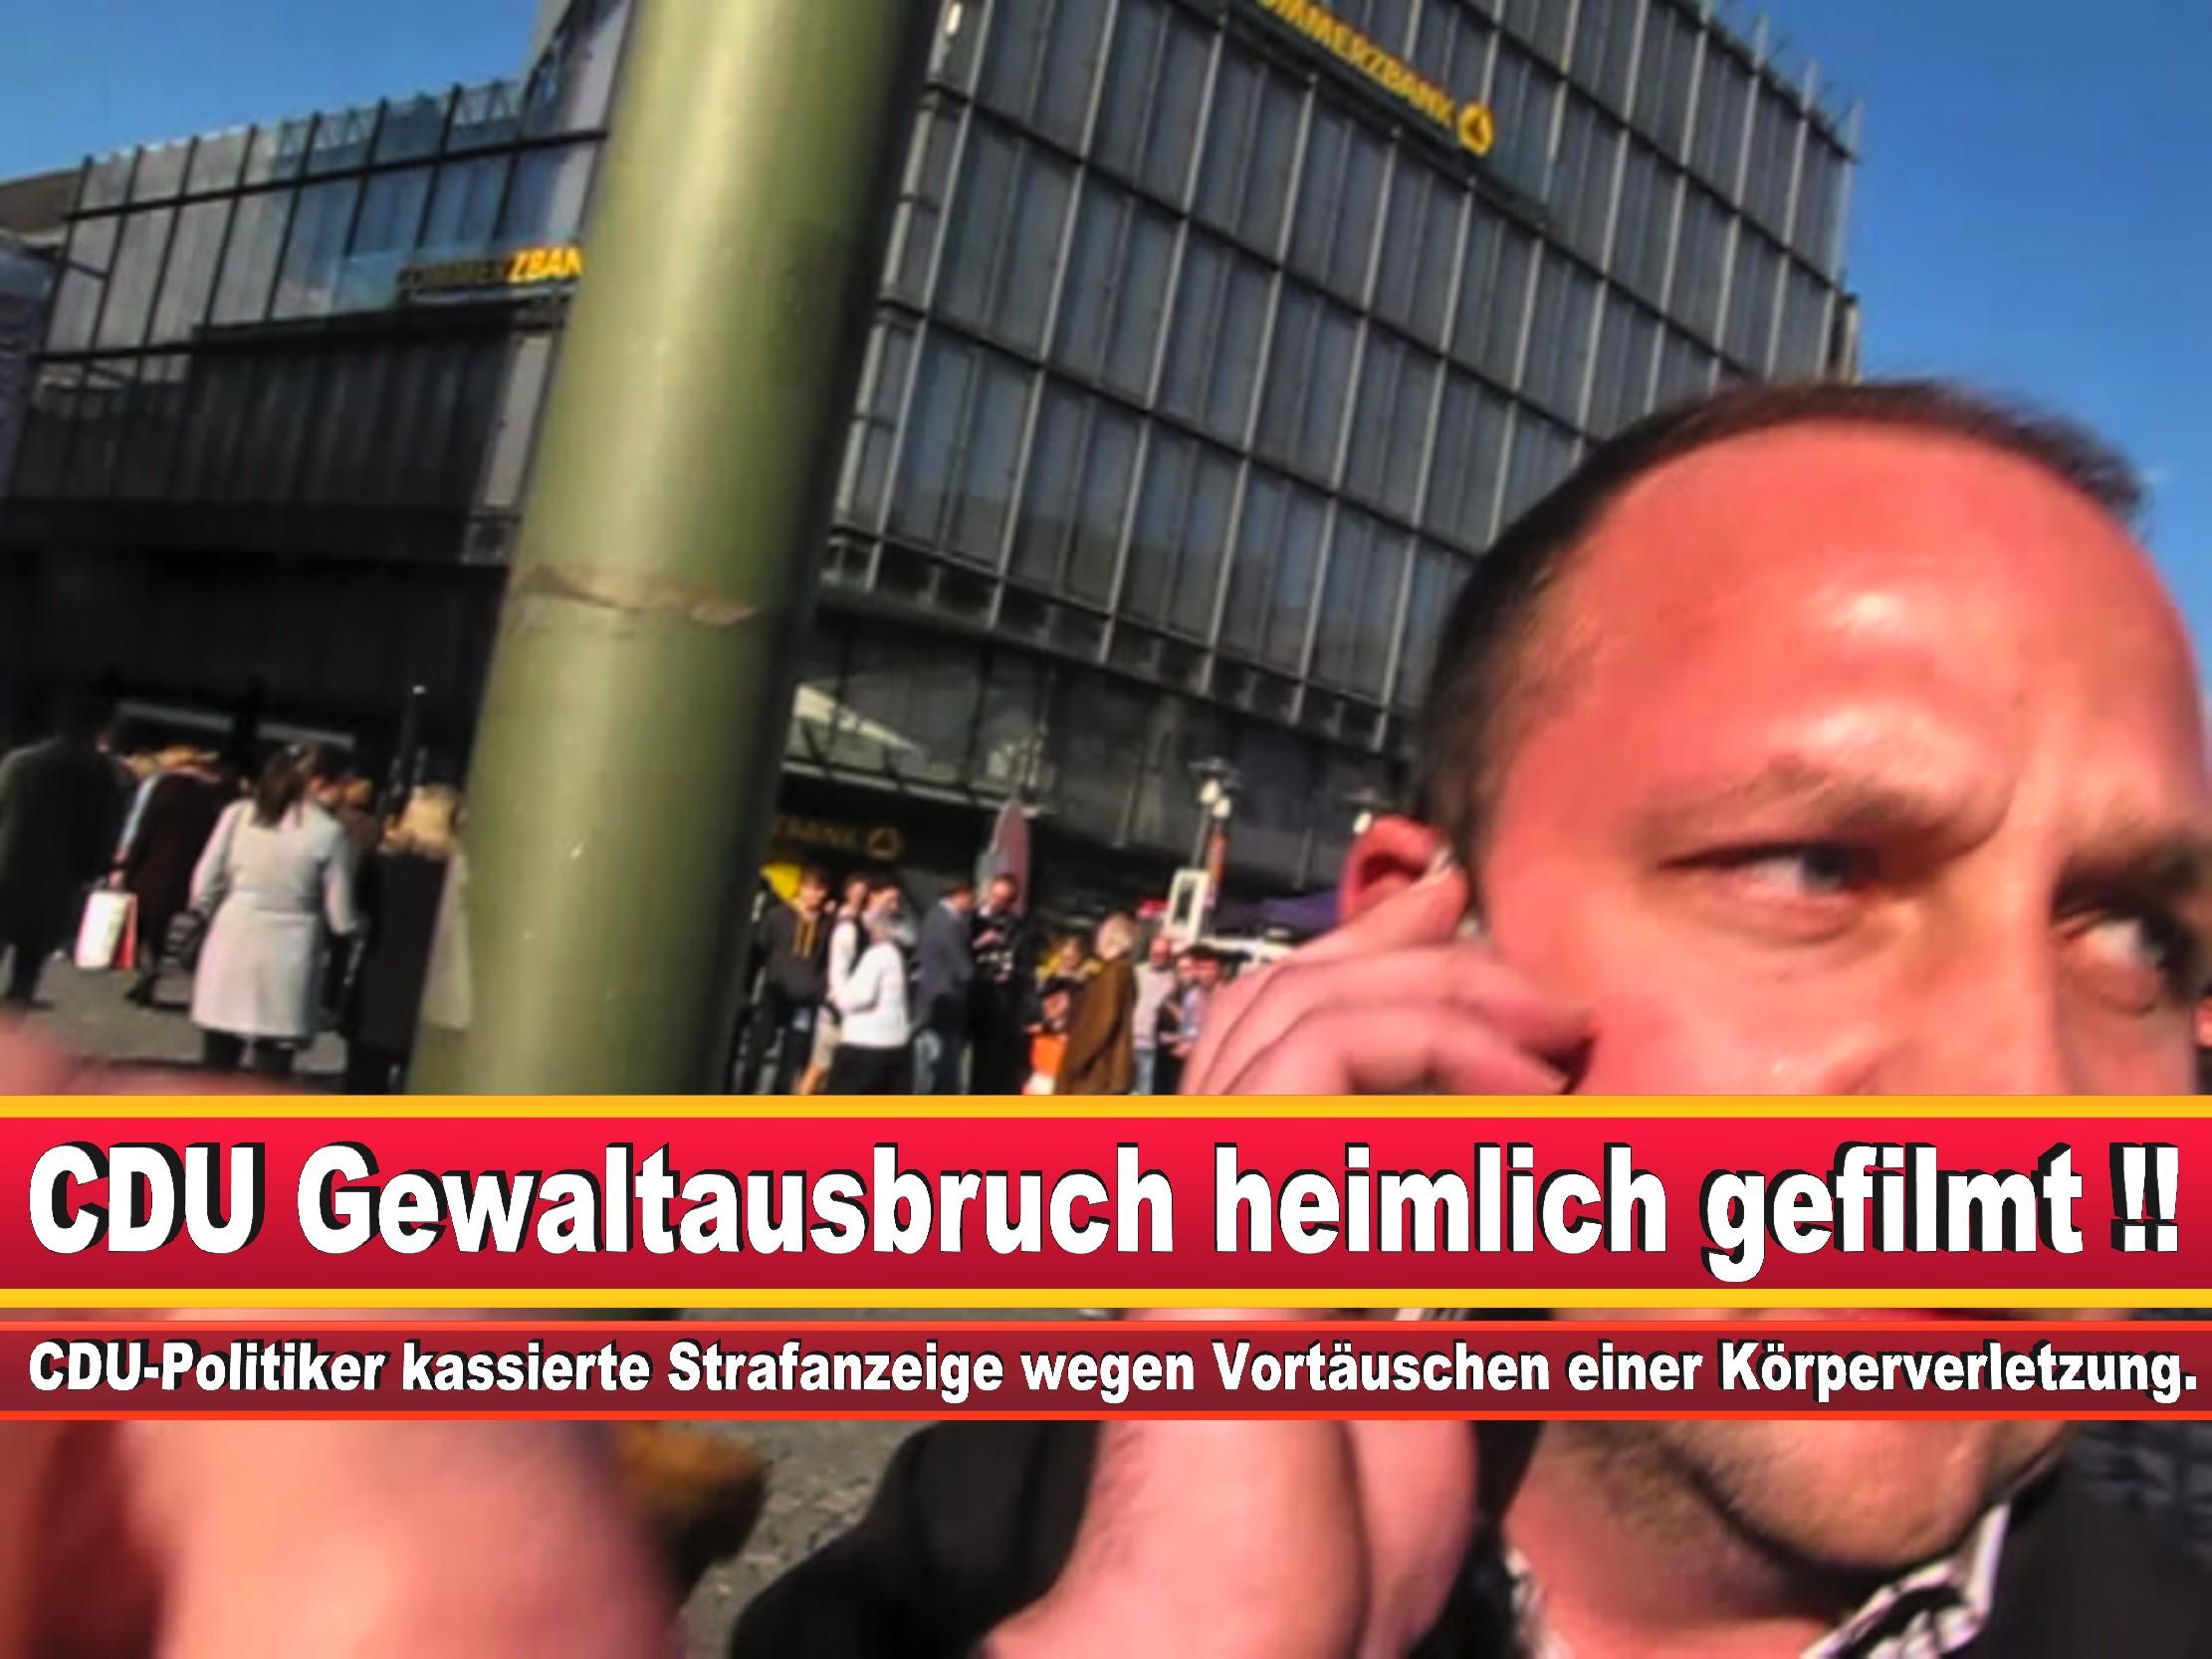 WESTFALEN BLATT KREIS GüTERSLOH